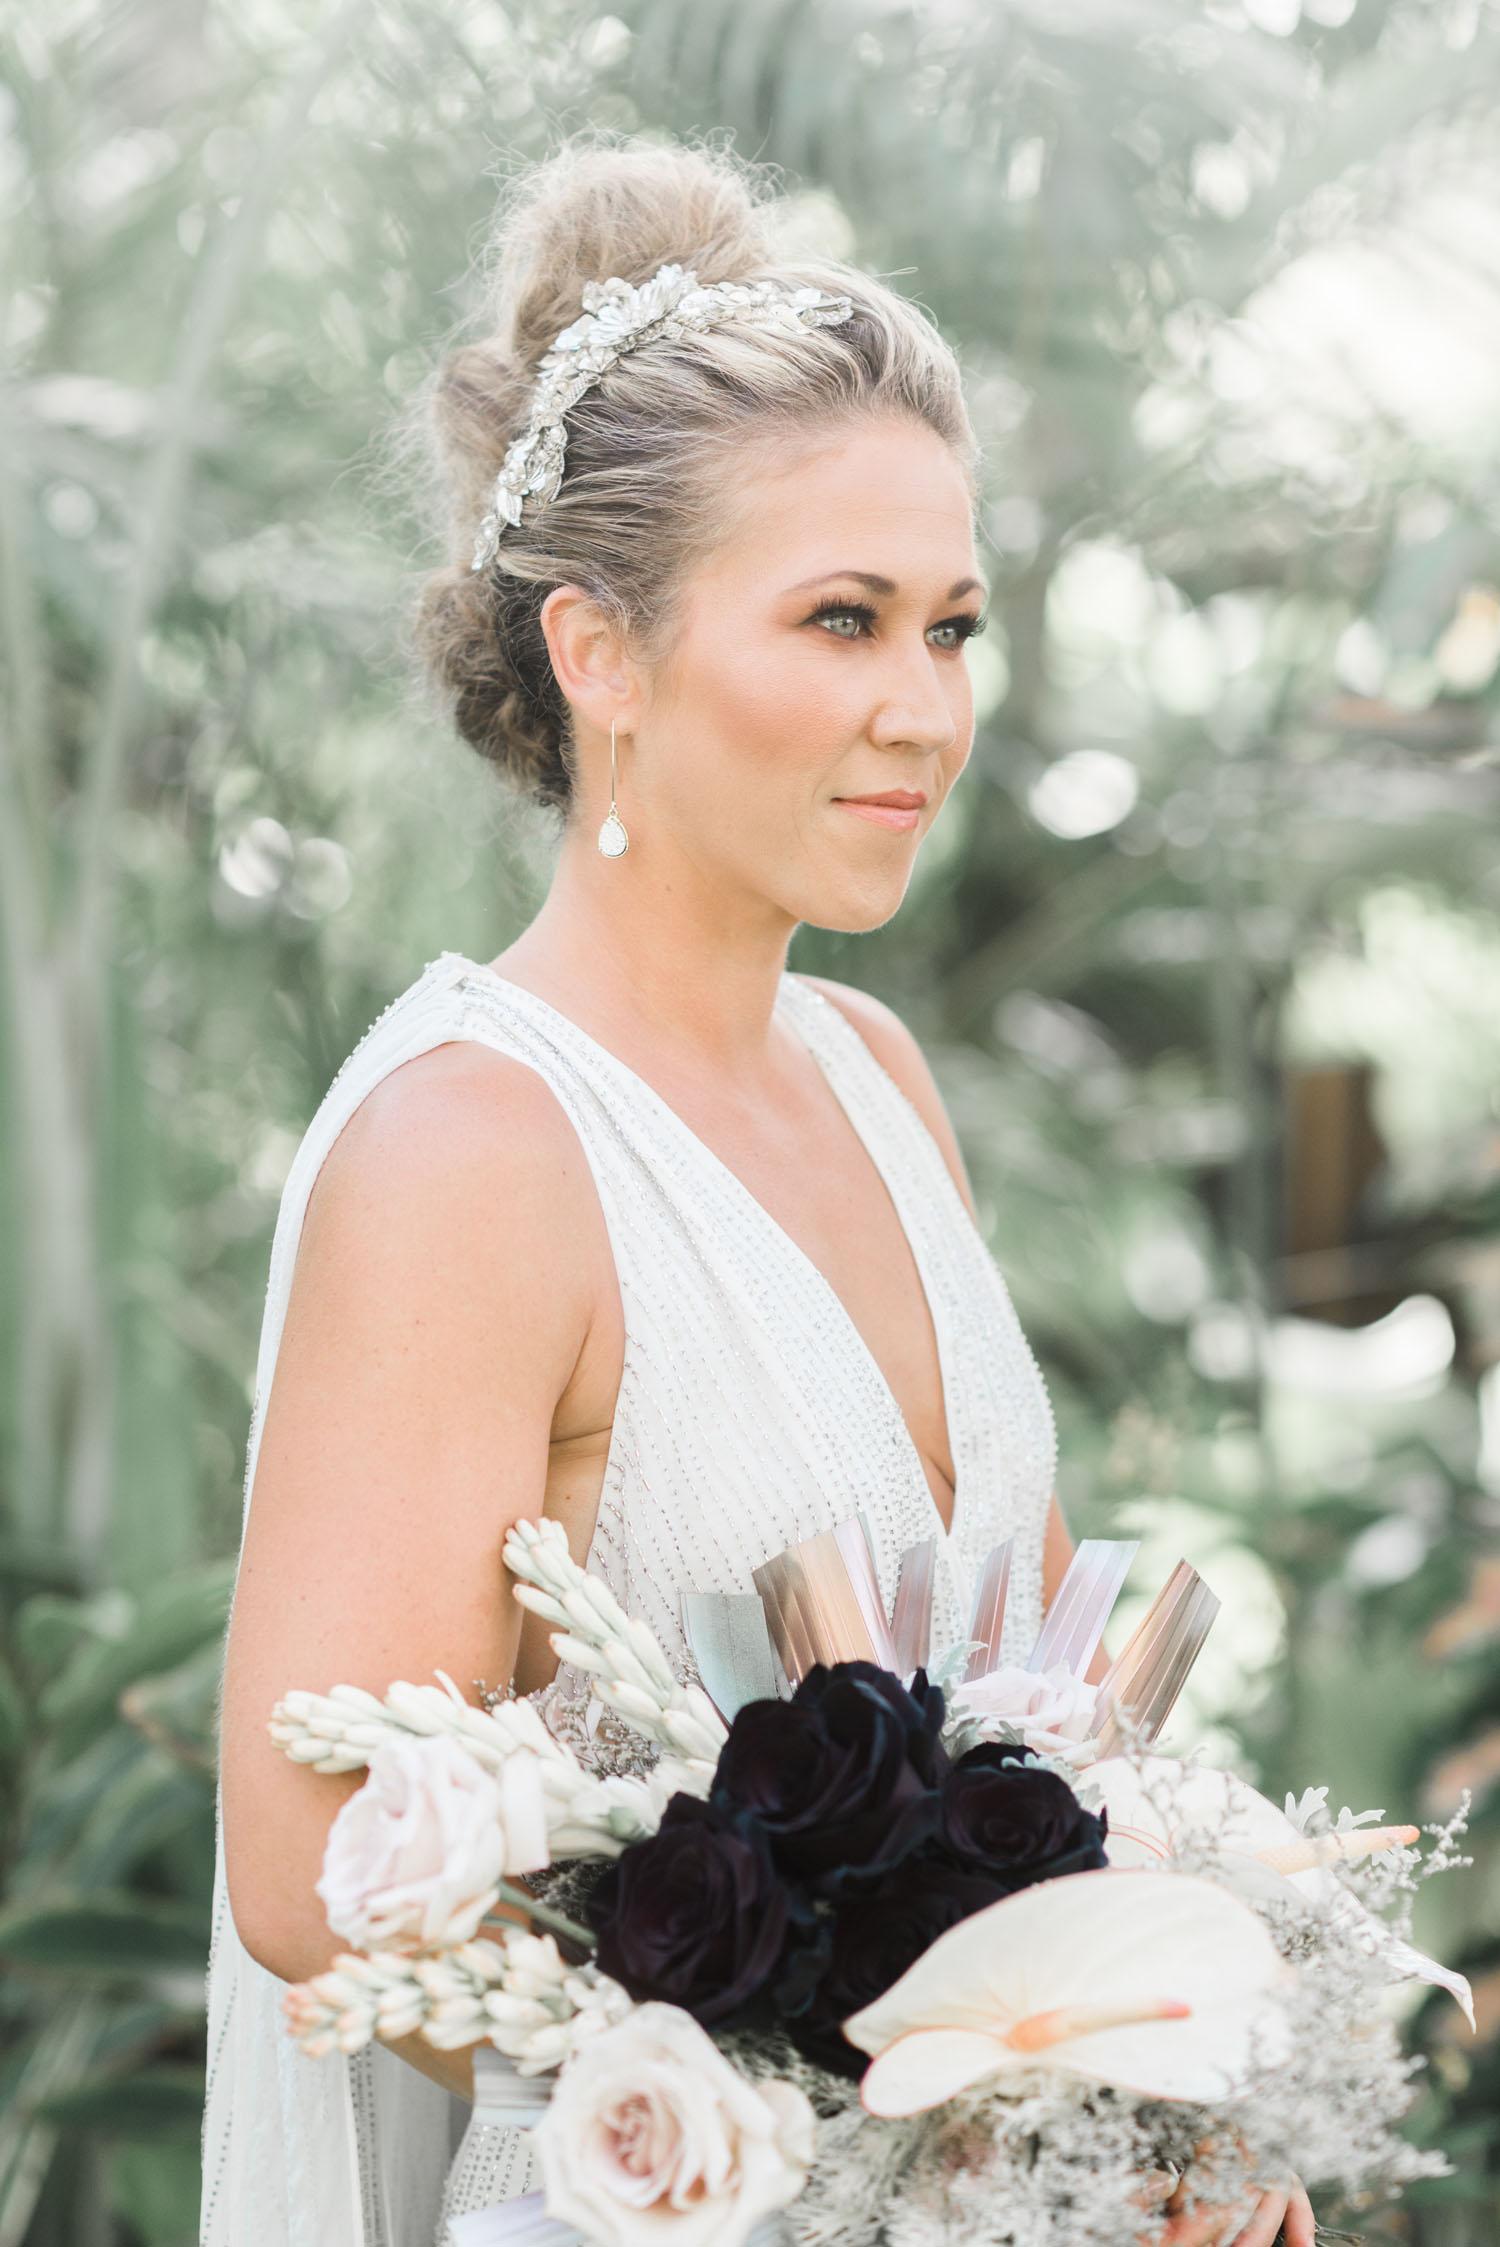 Star Wars bride